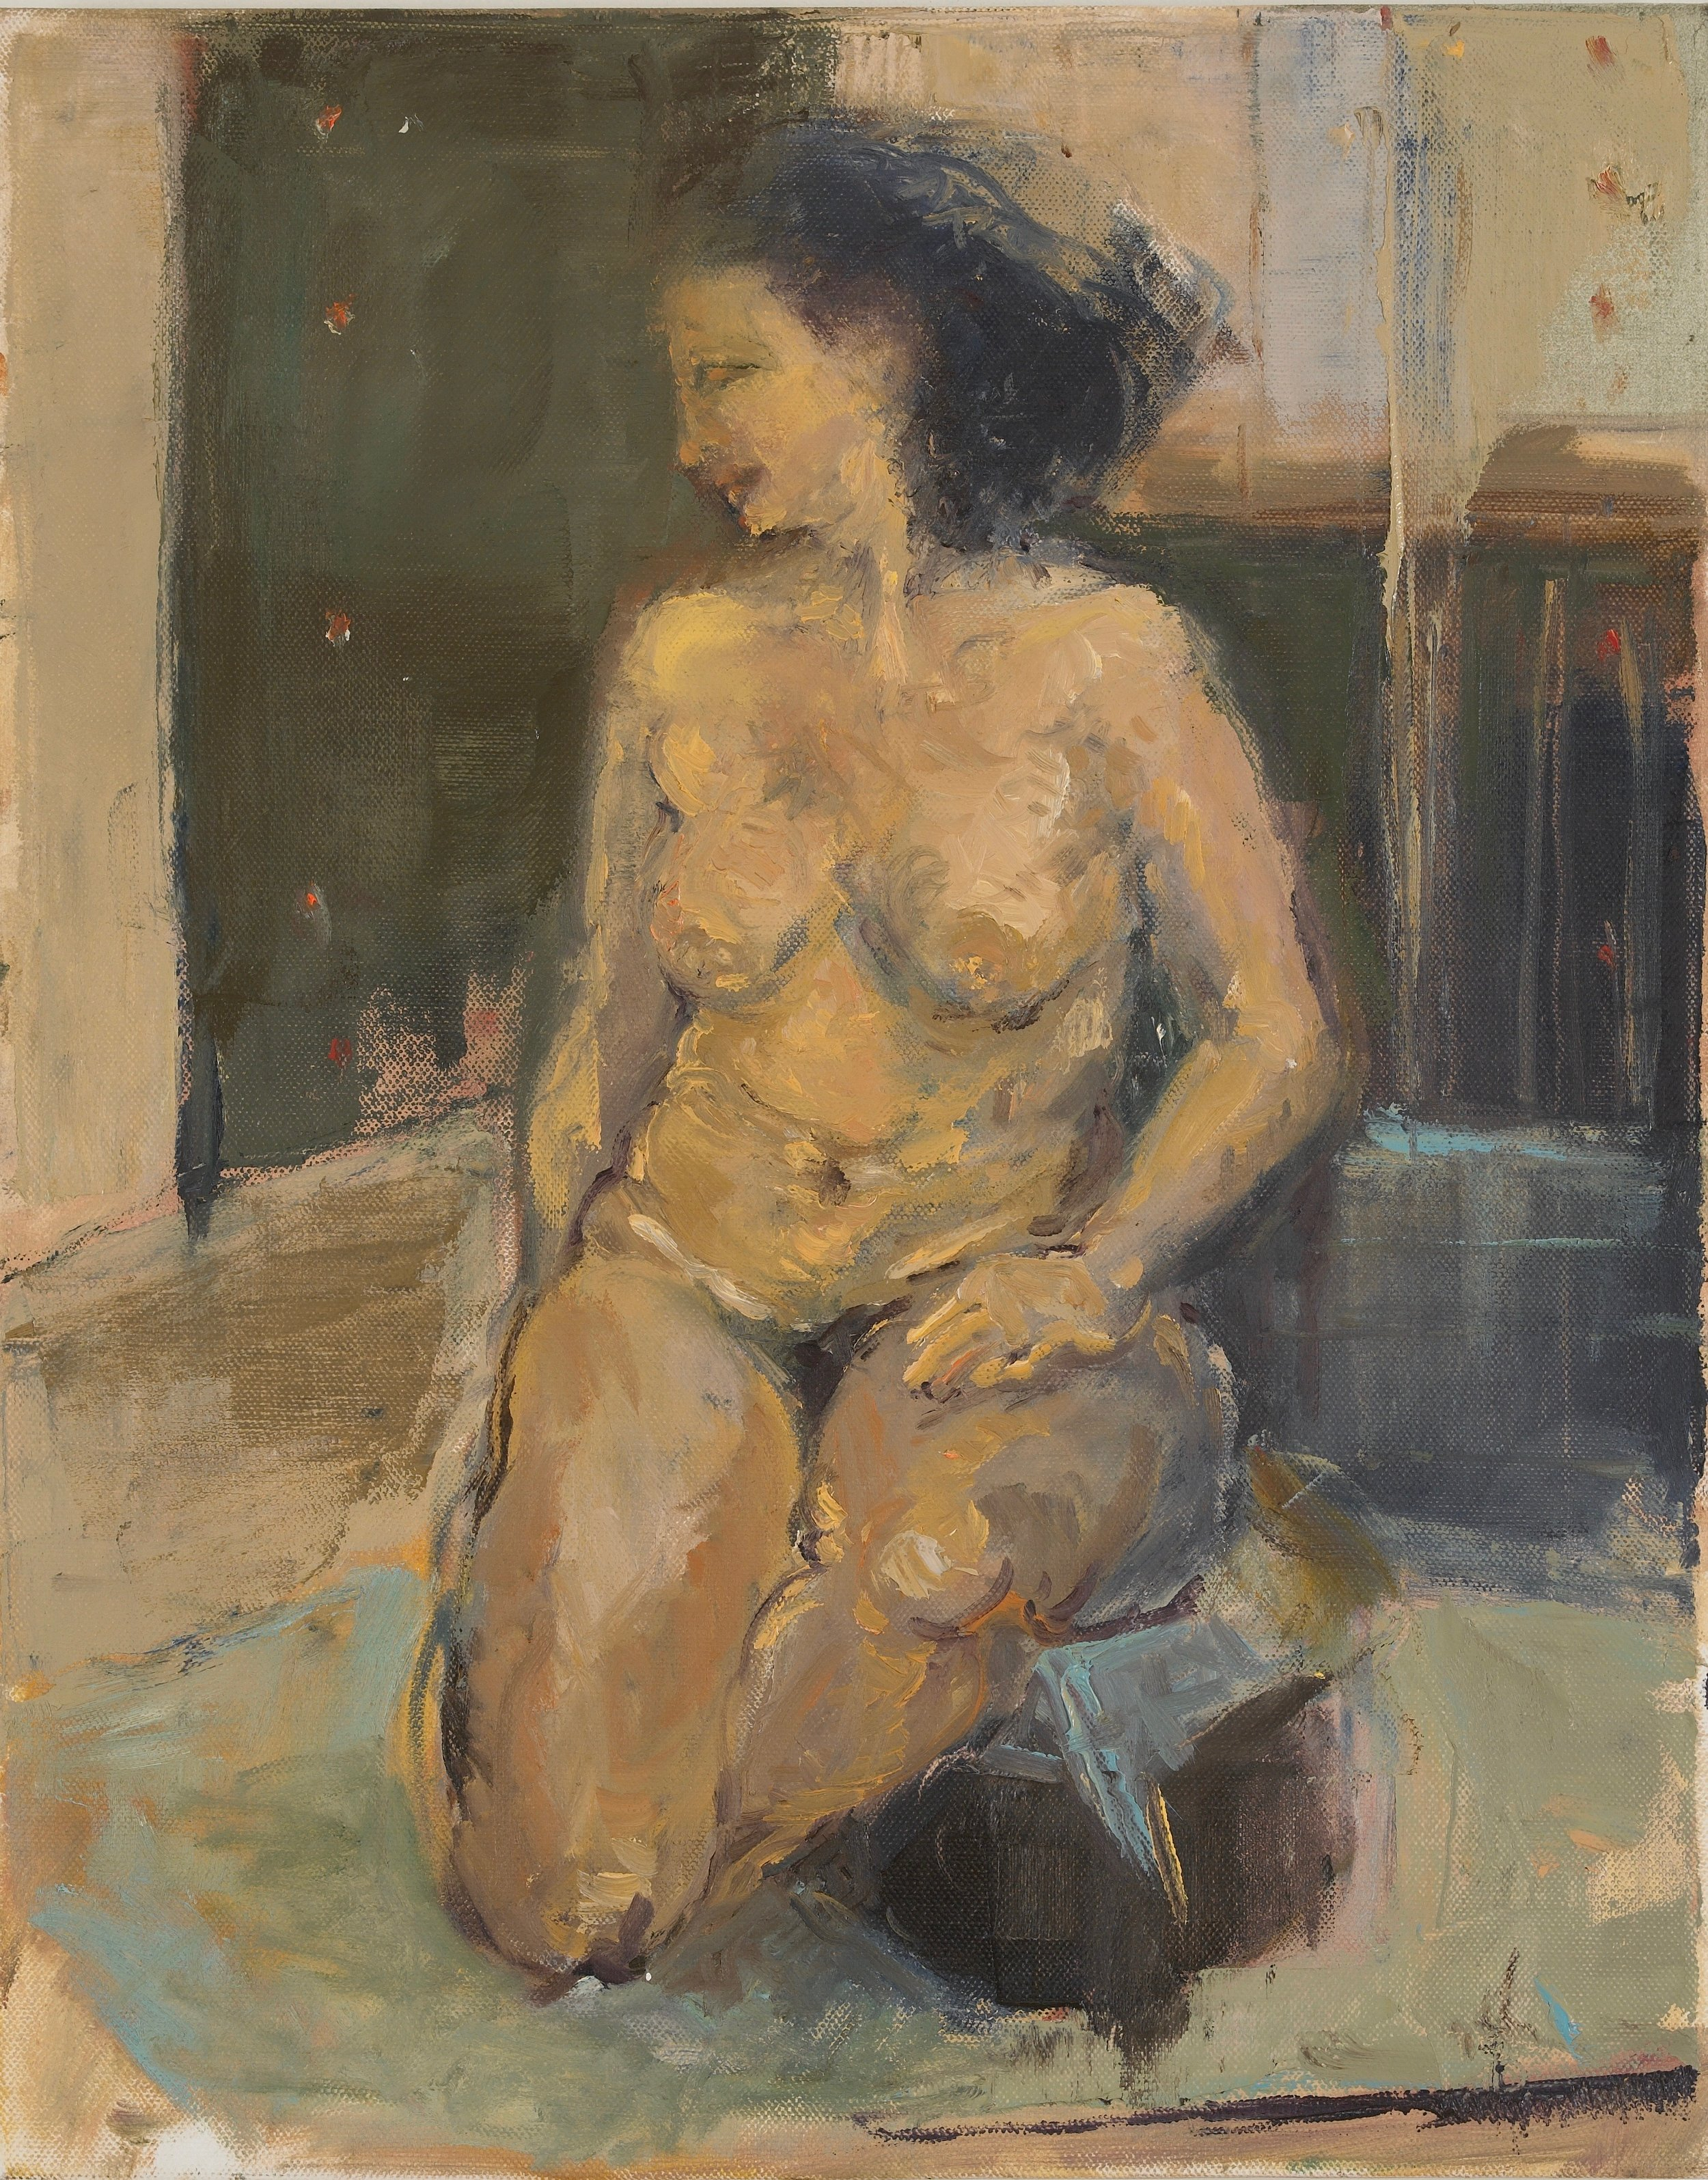 Nude on Short Stool  14X16 - Oil on Board